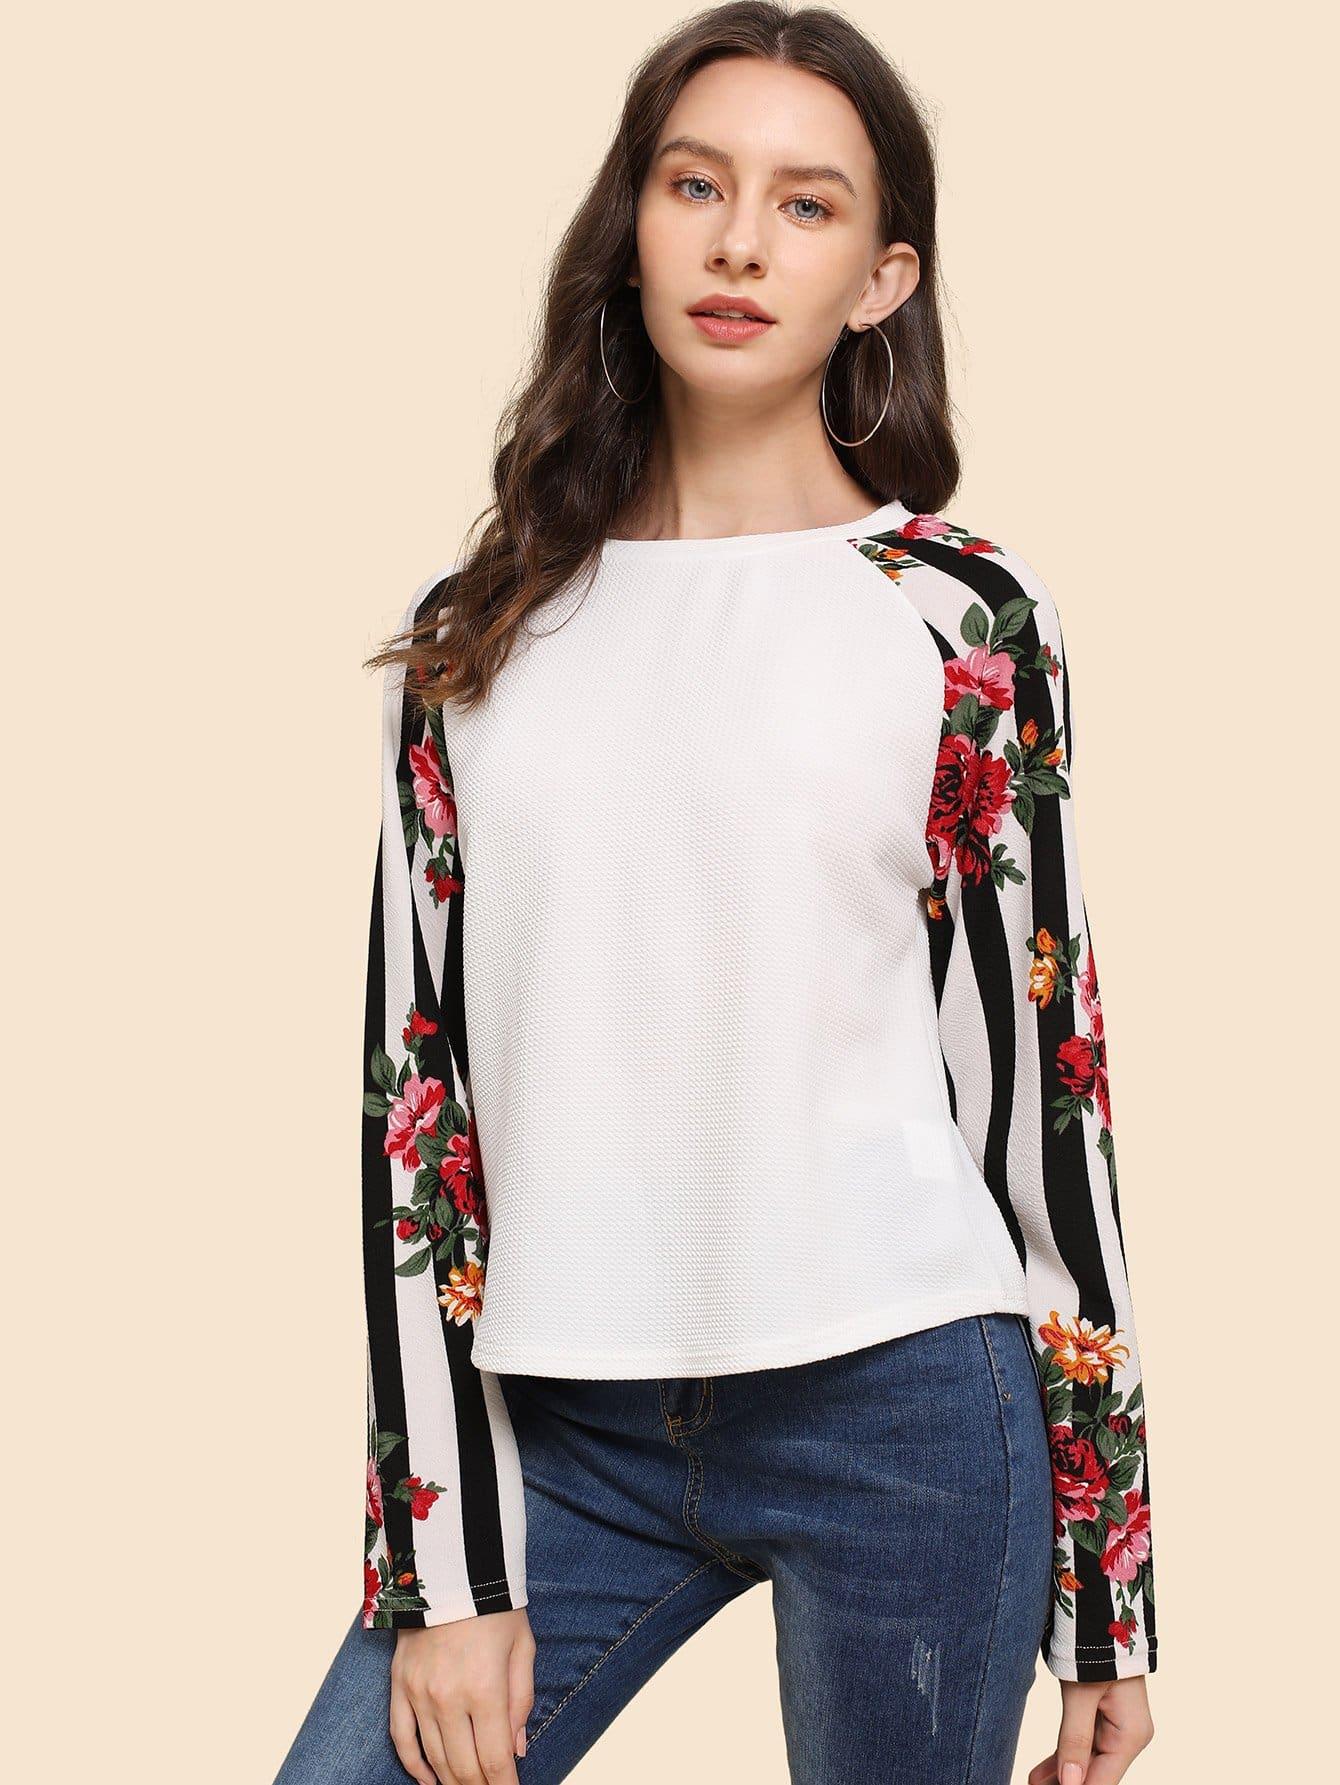 Купить Полосатая ситцевая футболка с рукав-регланами, Kate B, SheIn